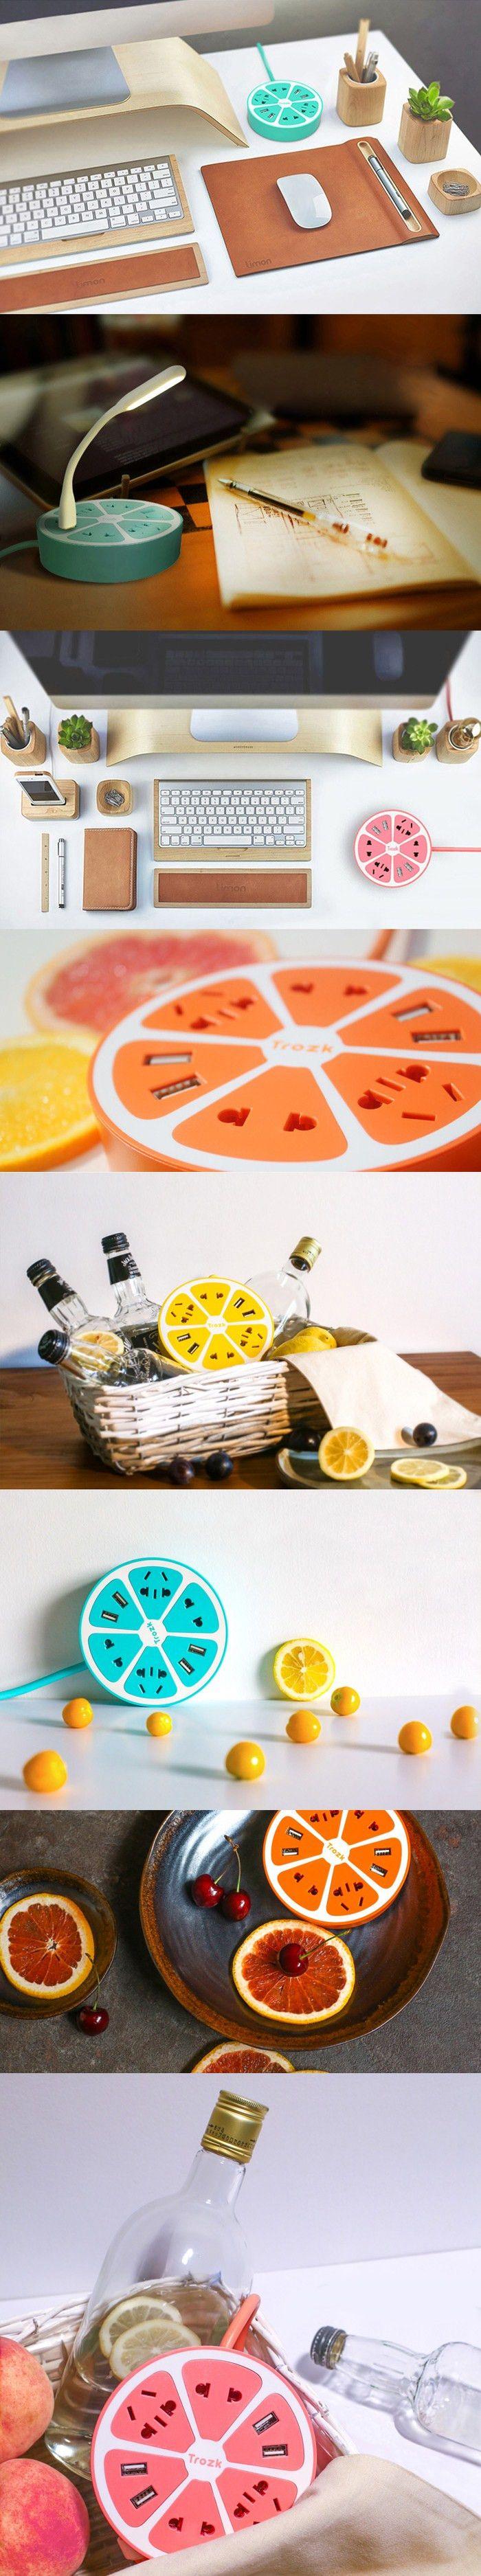 Trozk Lemon Shape Charging Power Strip  -  YELLOW                                                                                                                                                     More